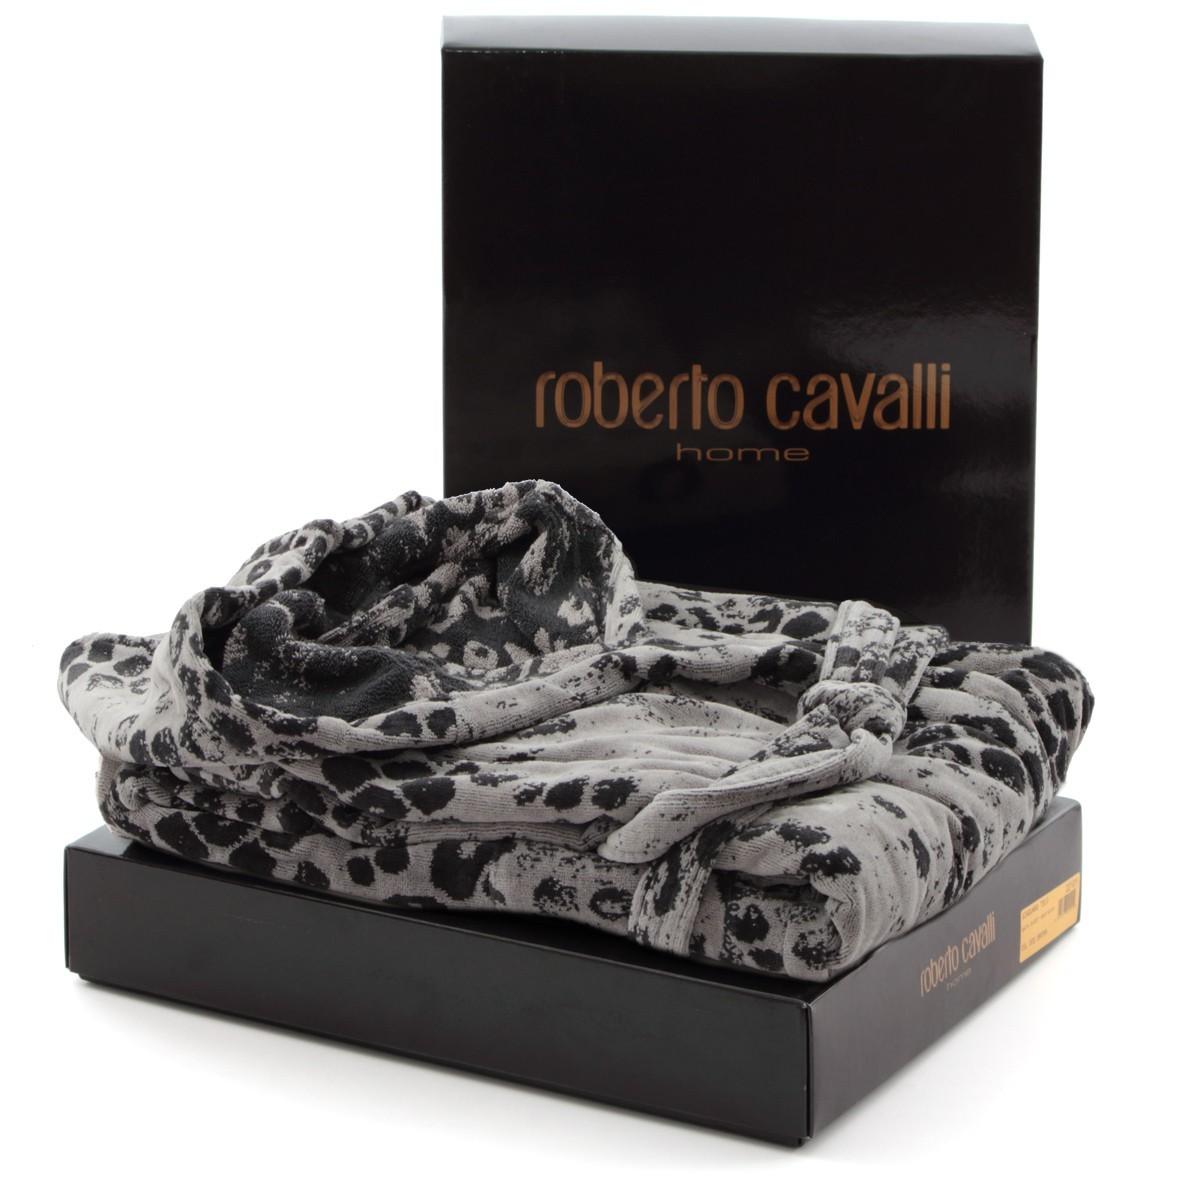 Халаты Халат велюровый Roberto Cavalli Giaguaro серый elitnyy-halat-velyurovyy-giaguaro-seryy-ot-roberto-cavalli-italiya.jpg